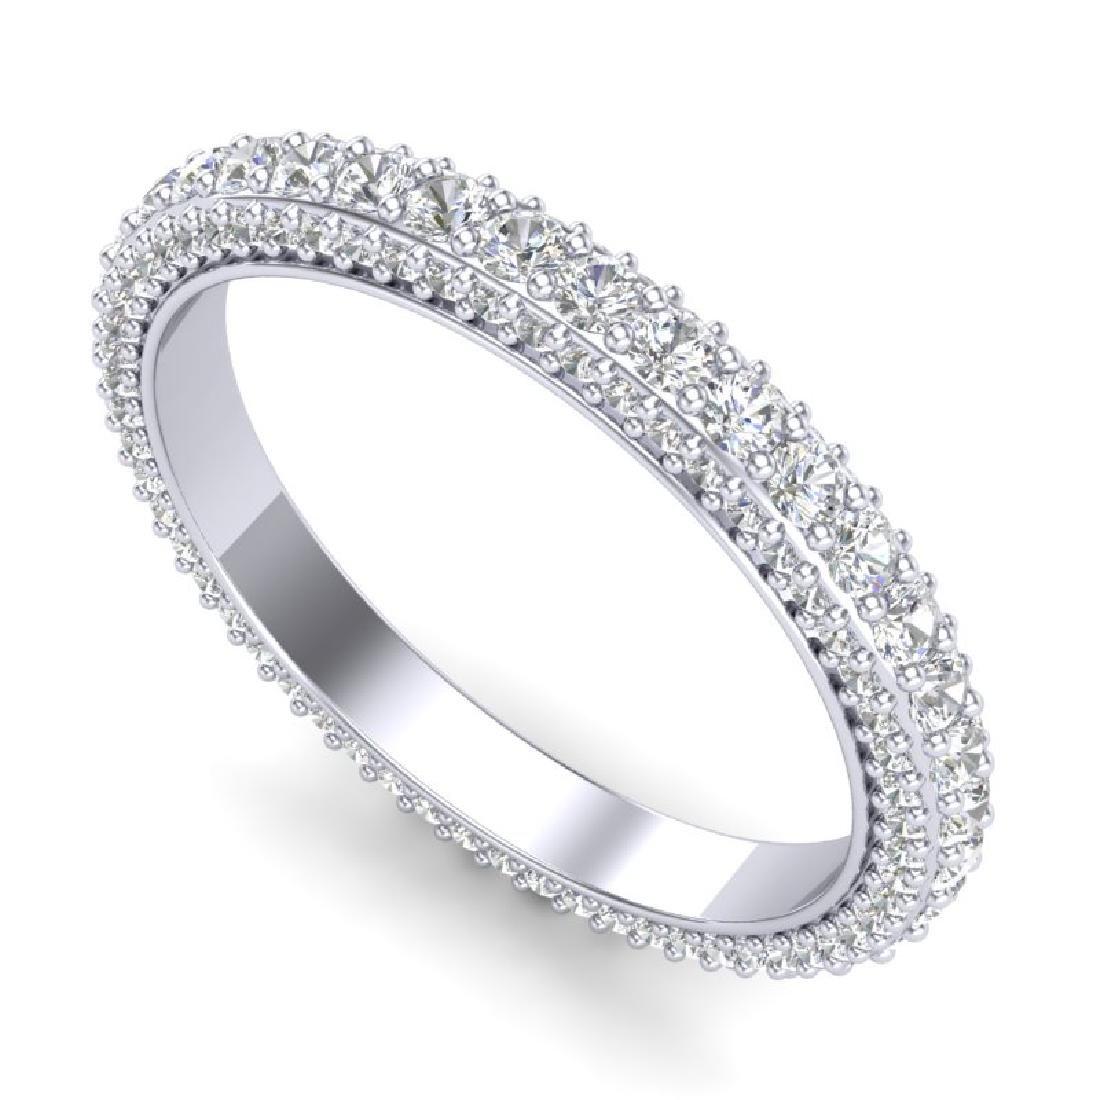 1.75 CTW VS/SI Diamond Art Deco Eternity Ring 18K White